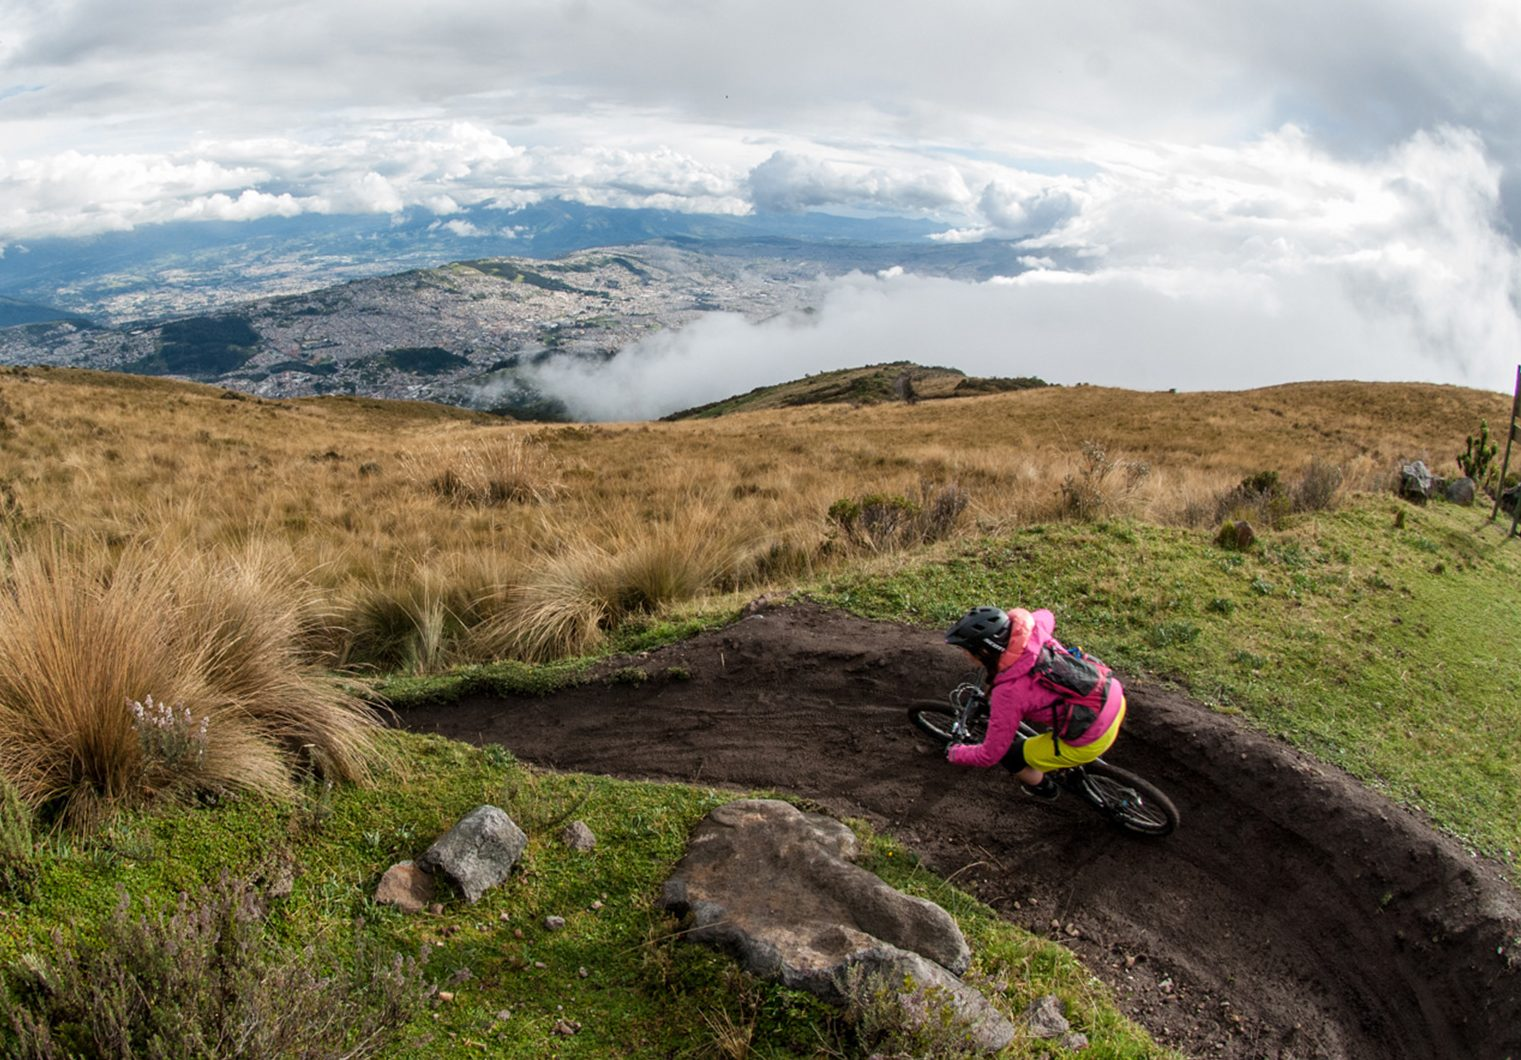 Circuito Quilotoa : Ecuador 10 day mountain biking tour discover the best mtb trails